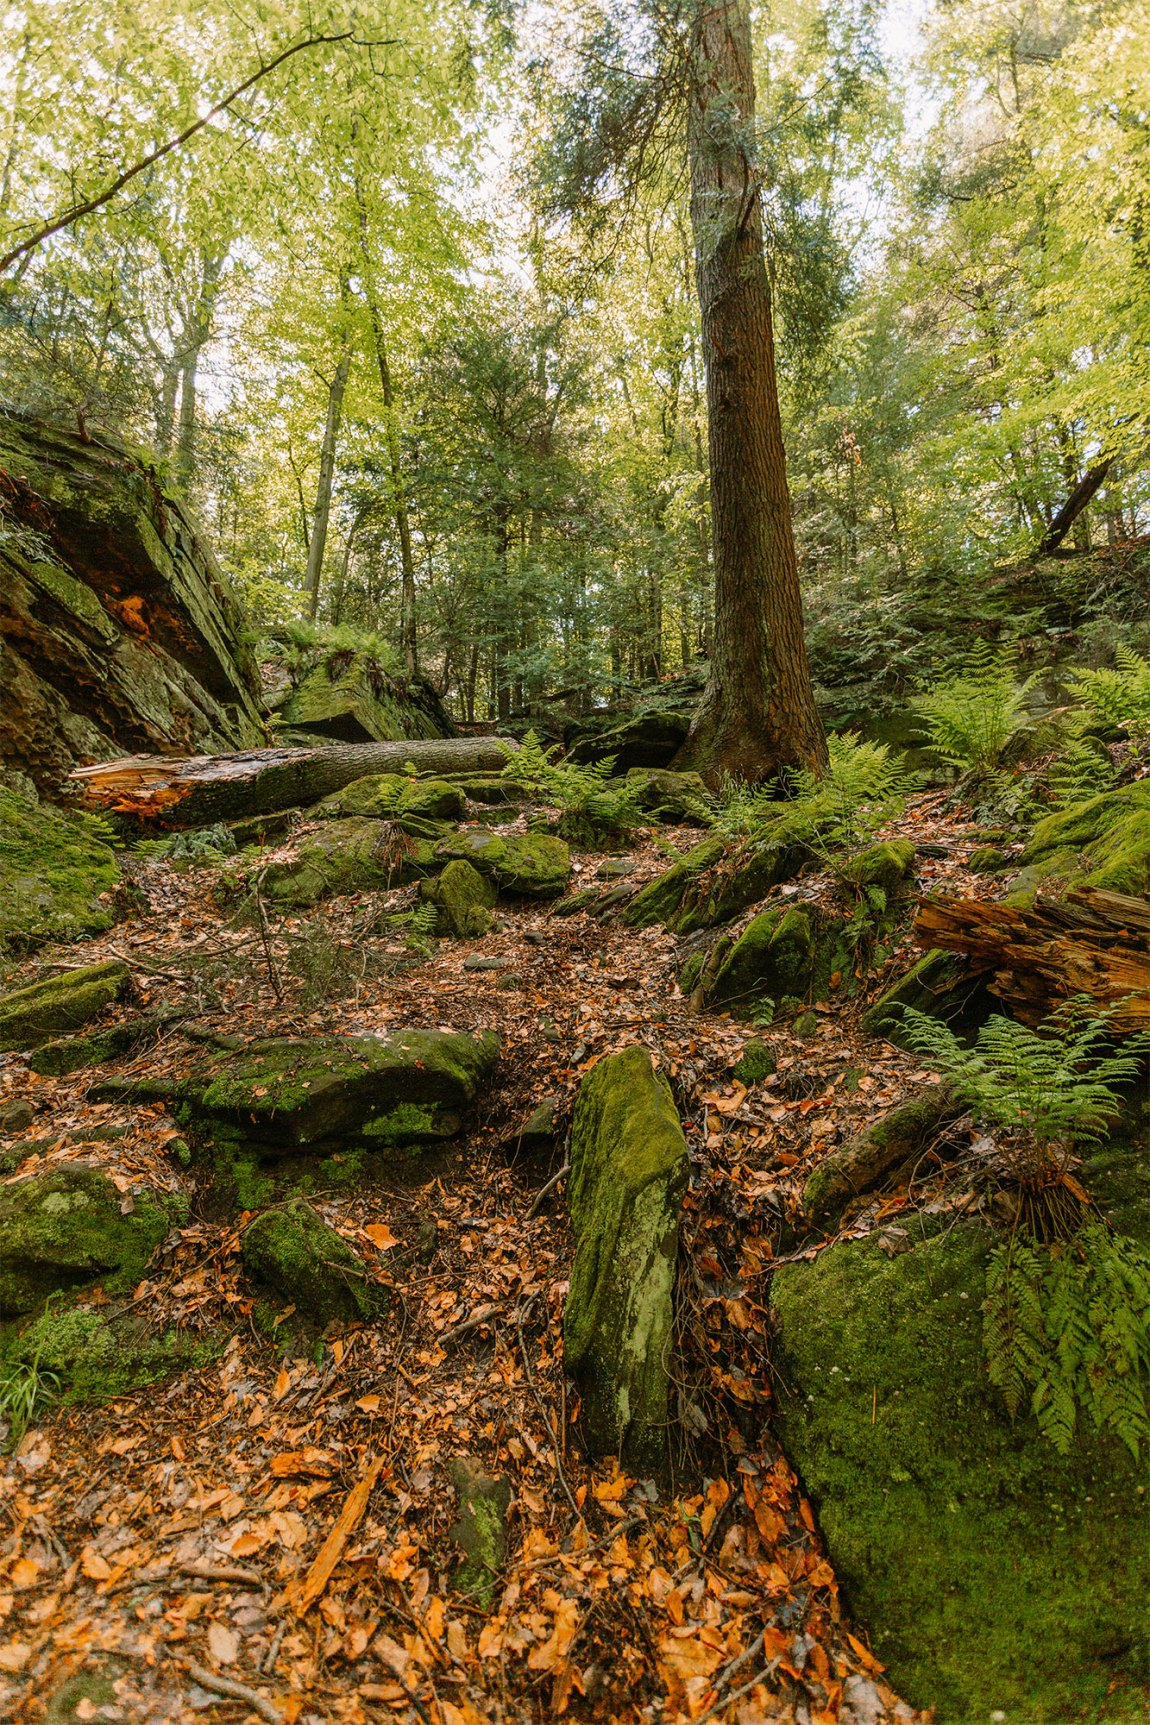 Tree growing between moss covered rocks